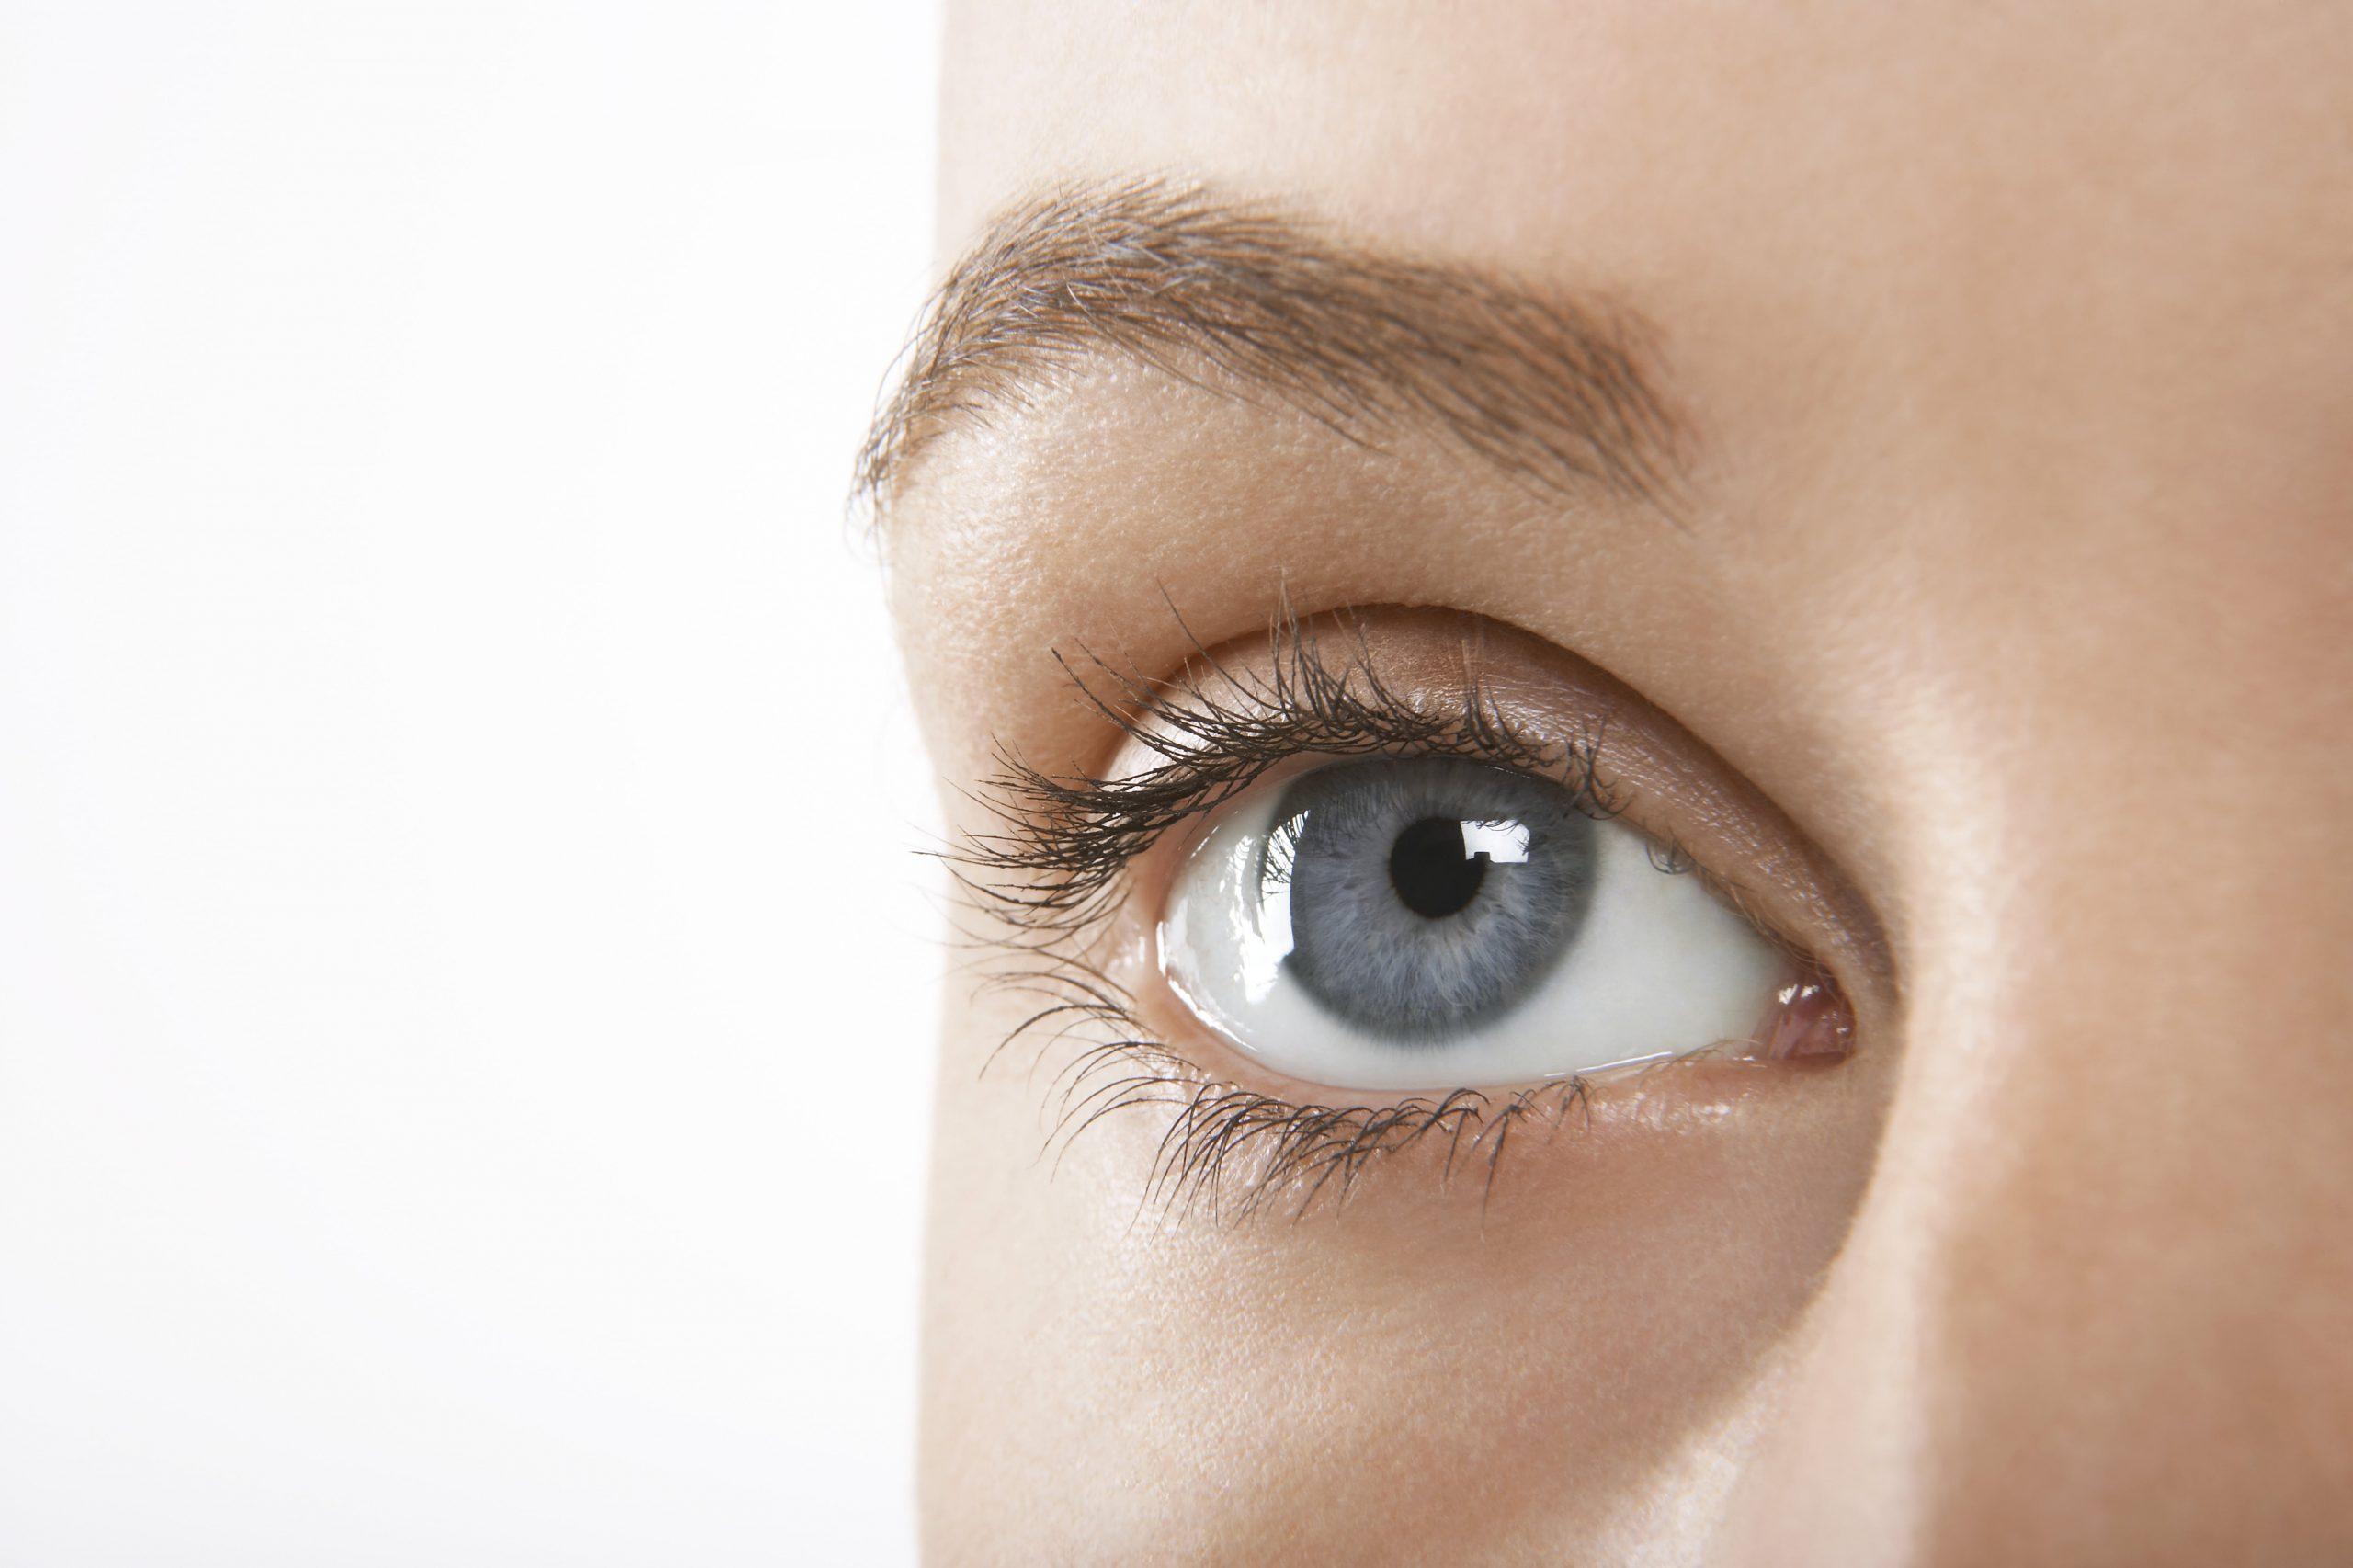 Central vision loss